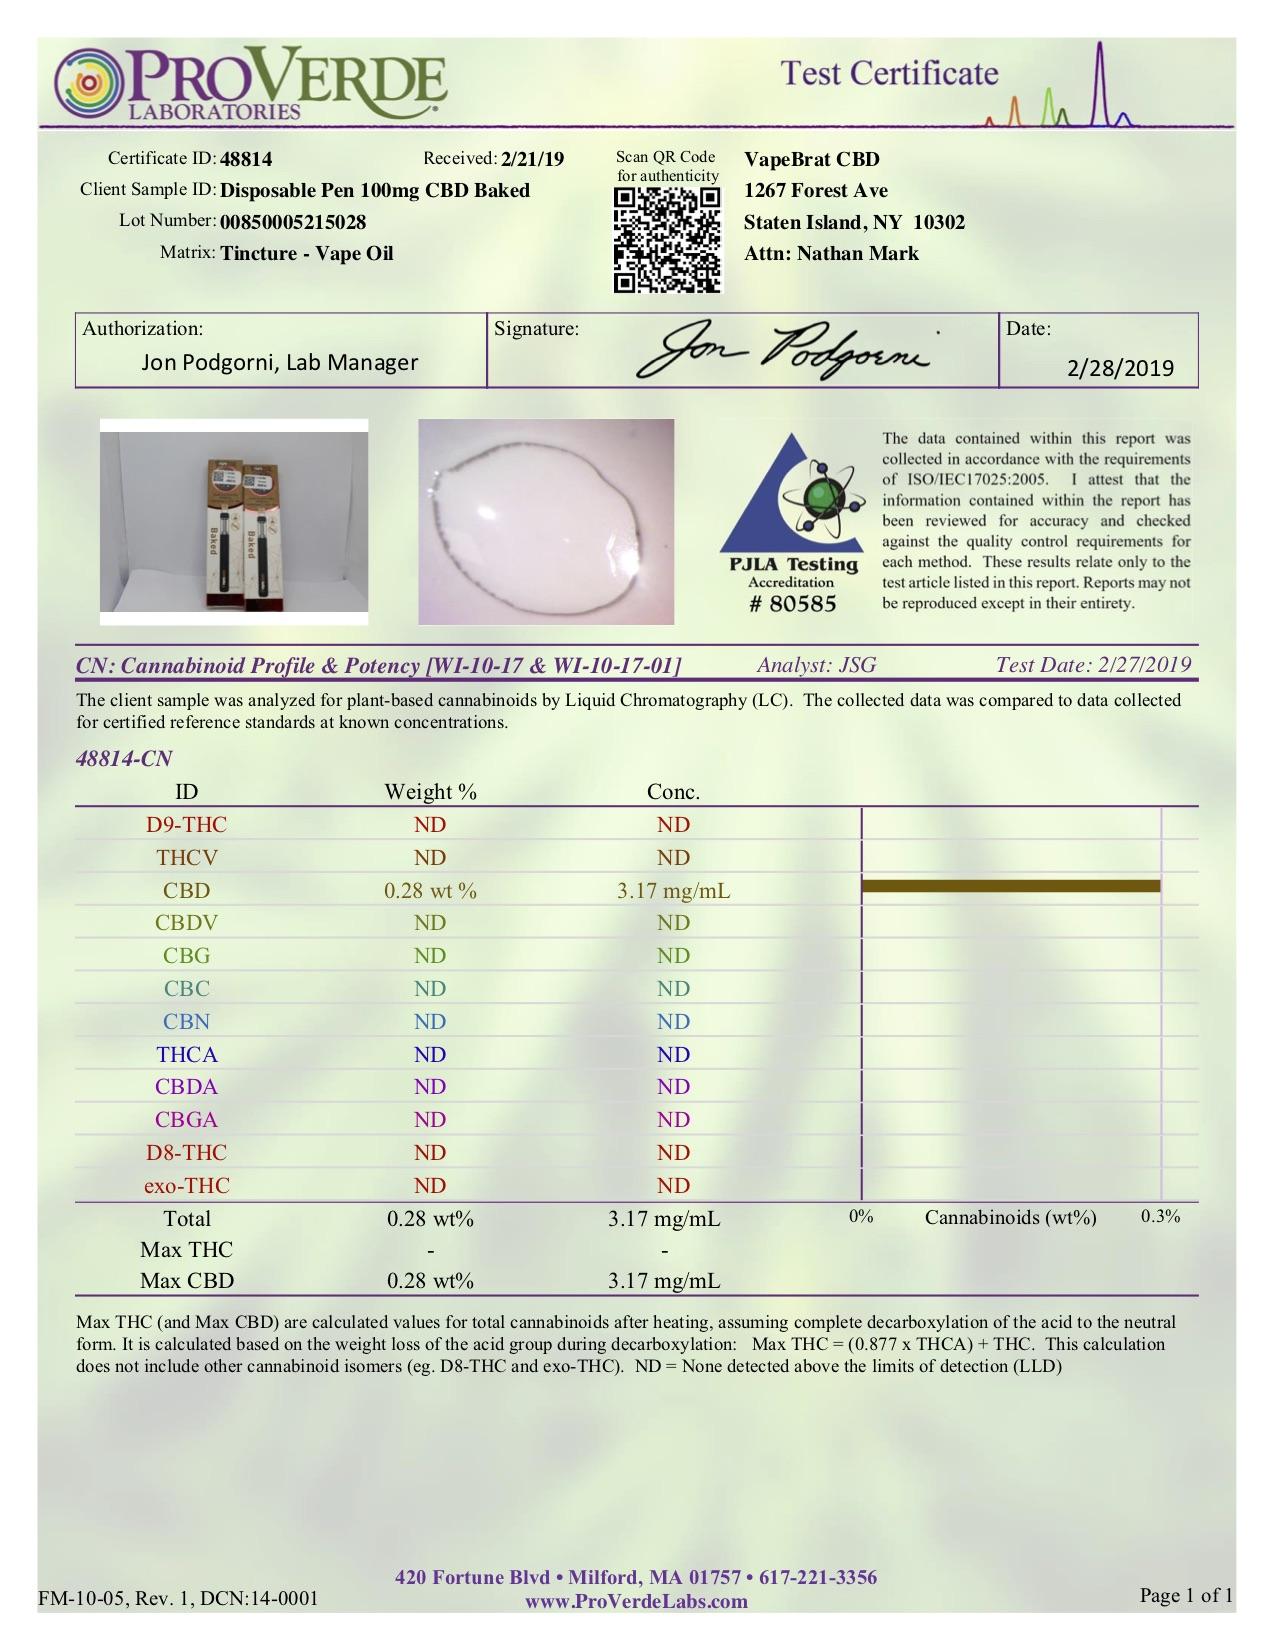 48814-cn-disposable-pen-100mg-cbd-baked.jpg